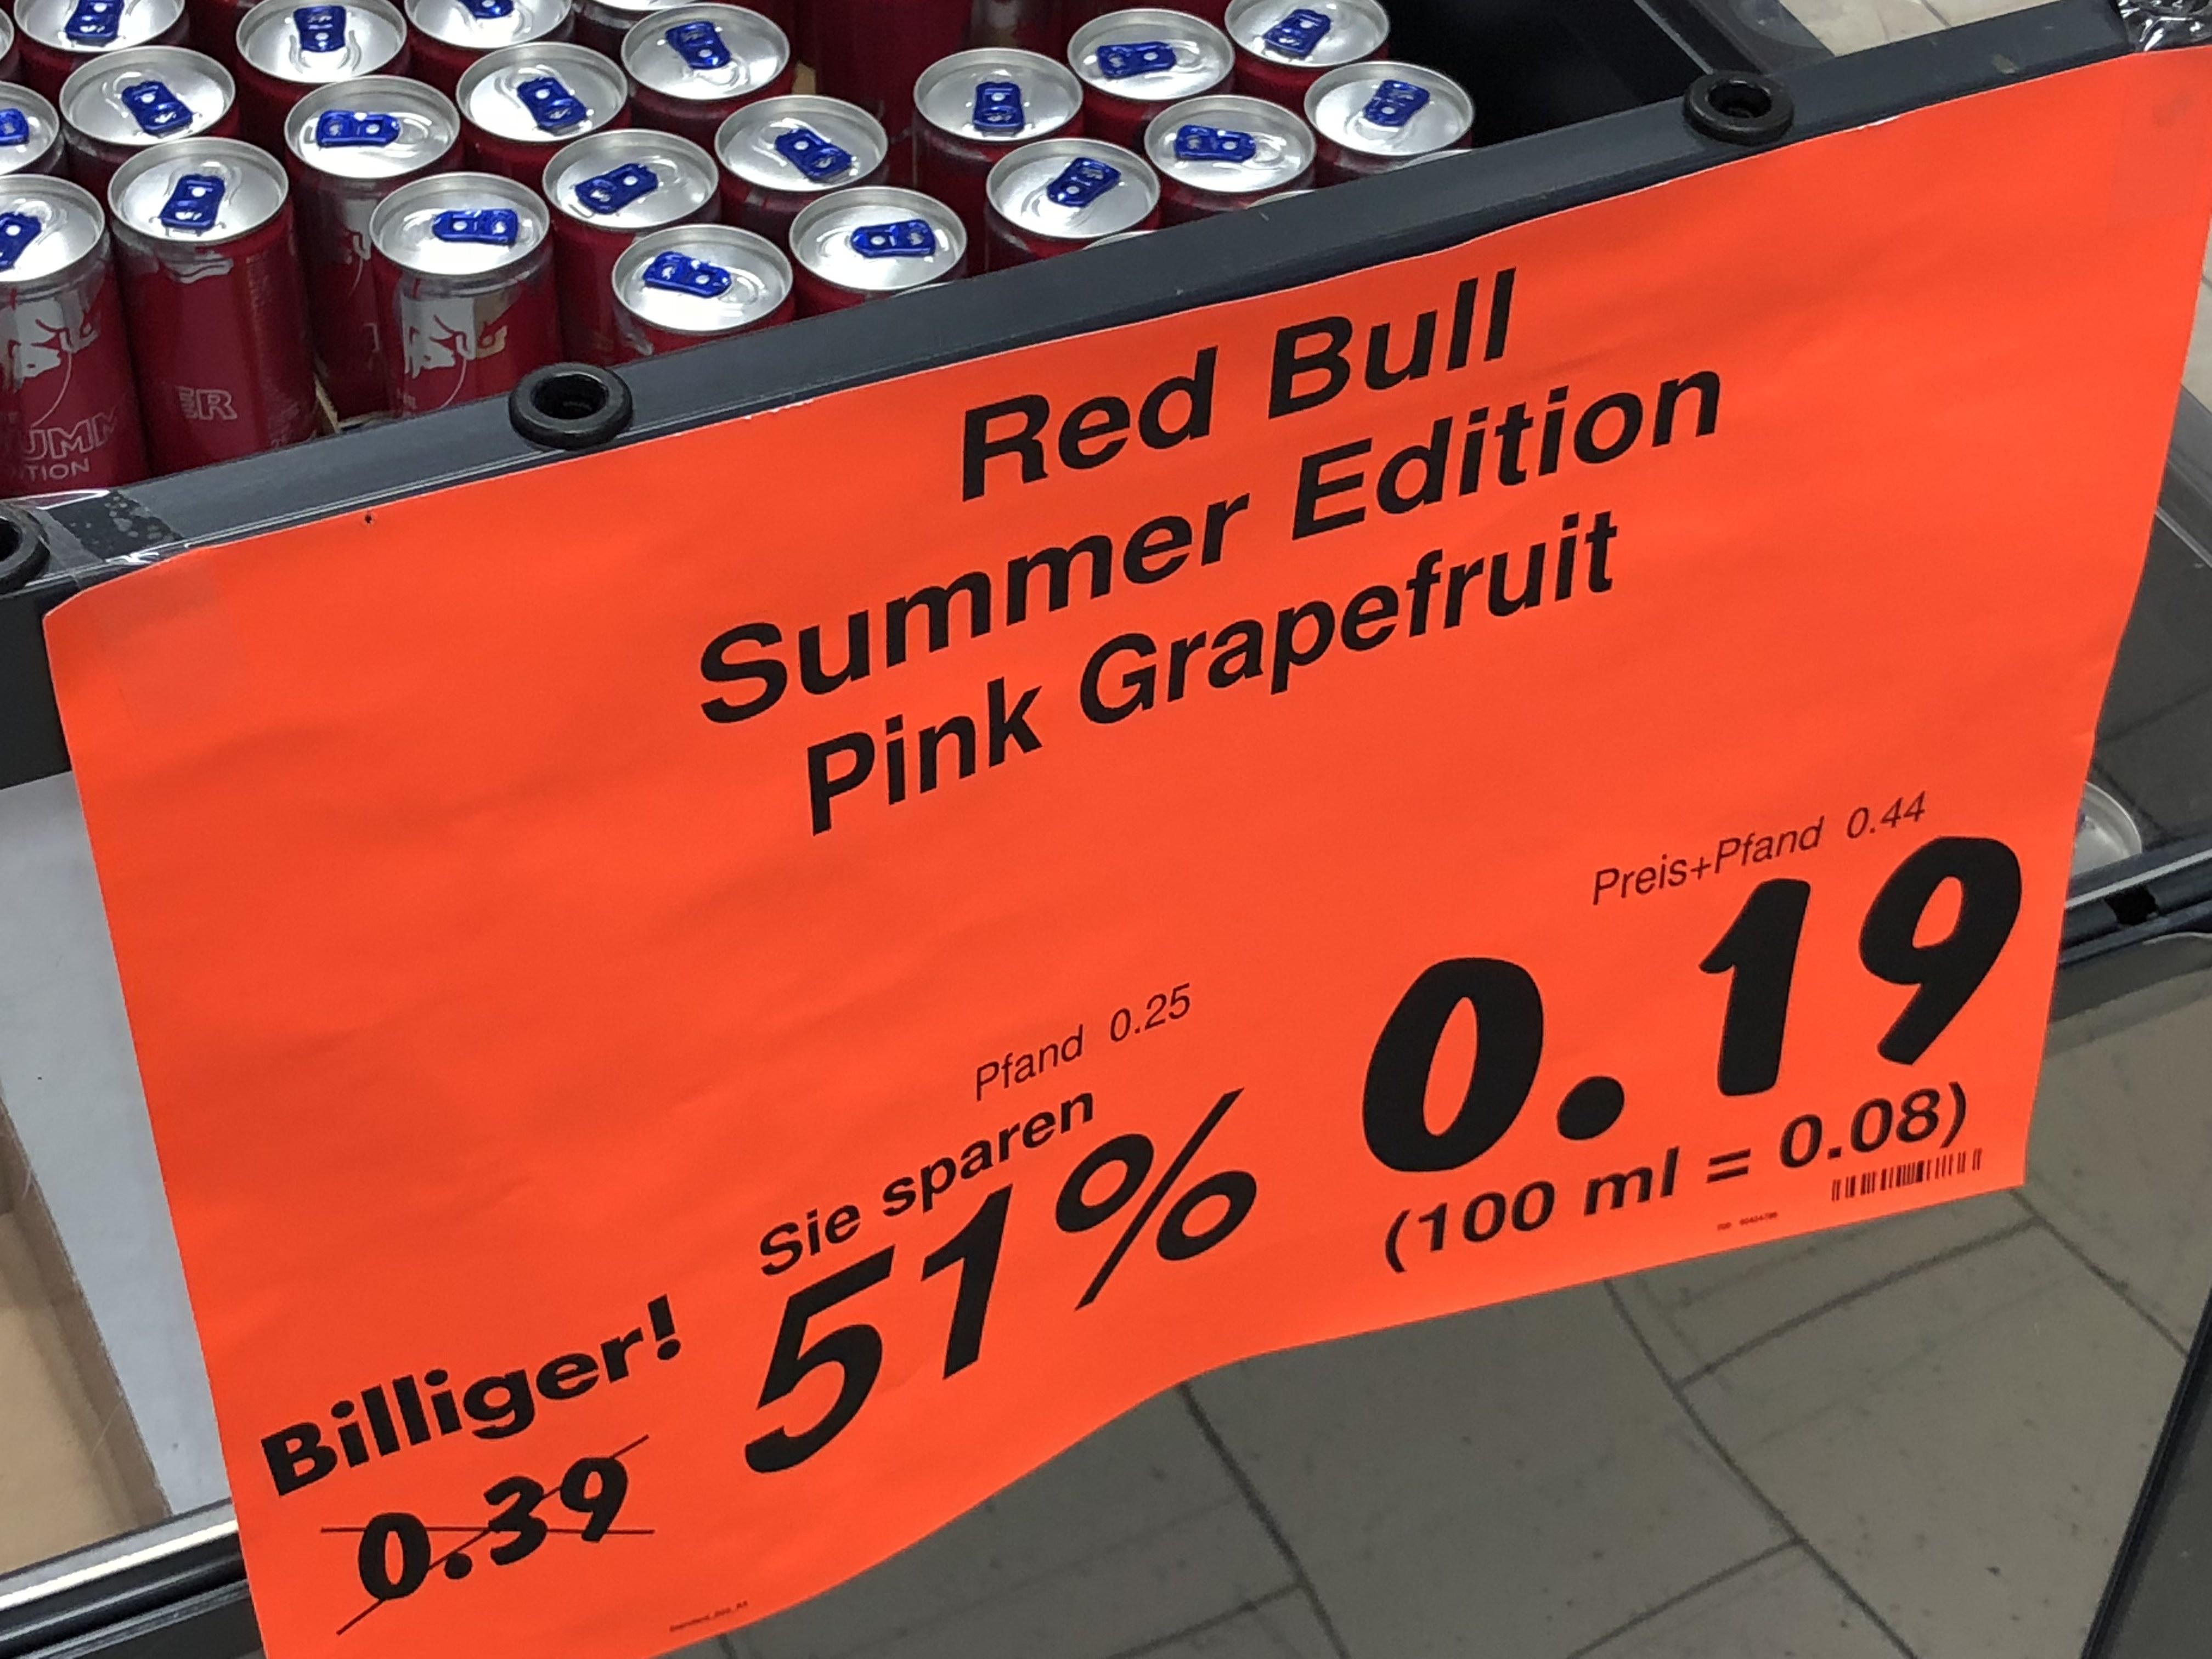 Redbull Summer Edition Pink Grapefreuit Hamburg Lurup Kaufland